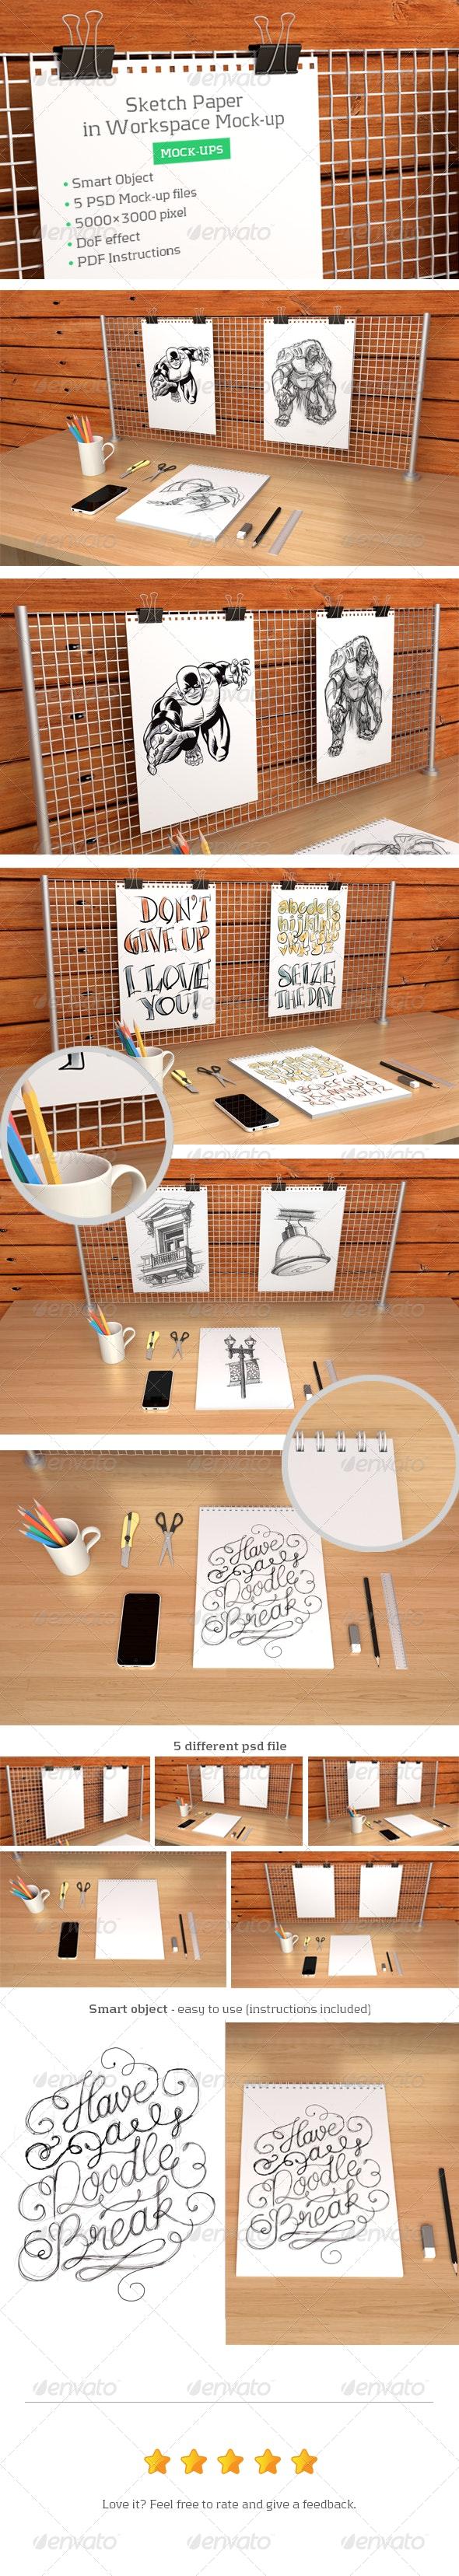 Sketch Paper in Workspace Mock-up - Print Product Mock-Ups